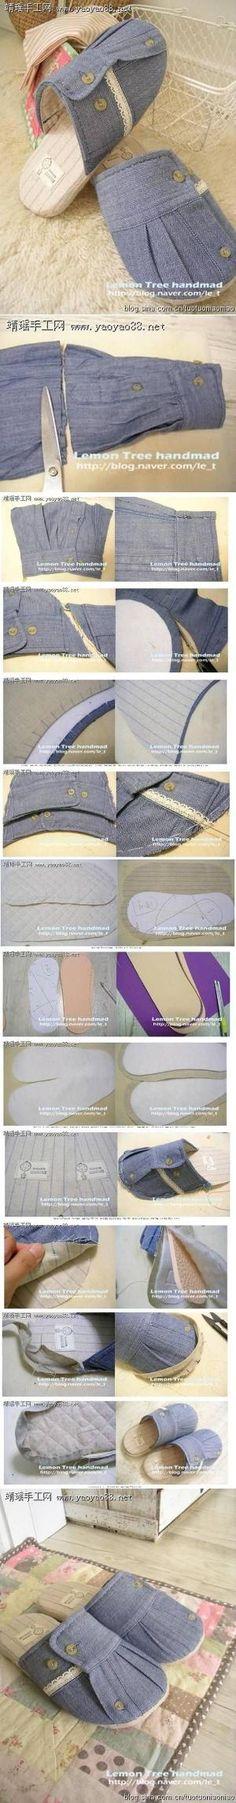 DIY Old Clothes Cuff Slipper by kristine